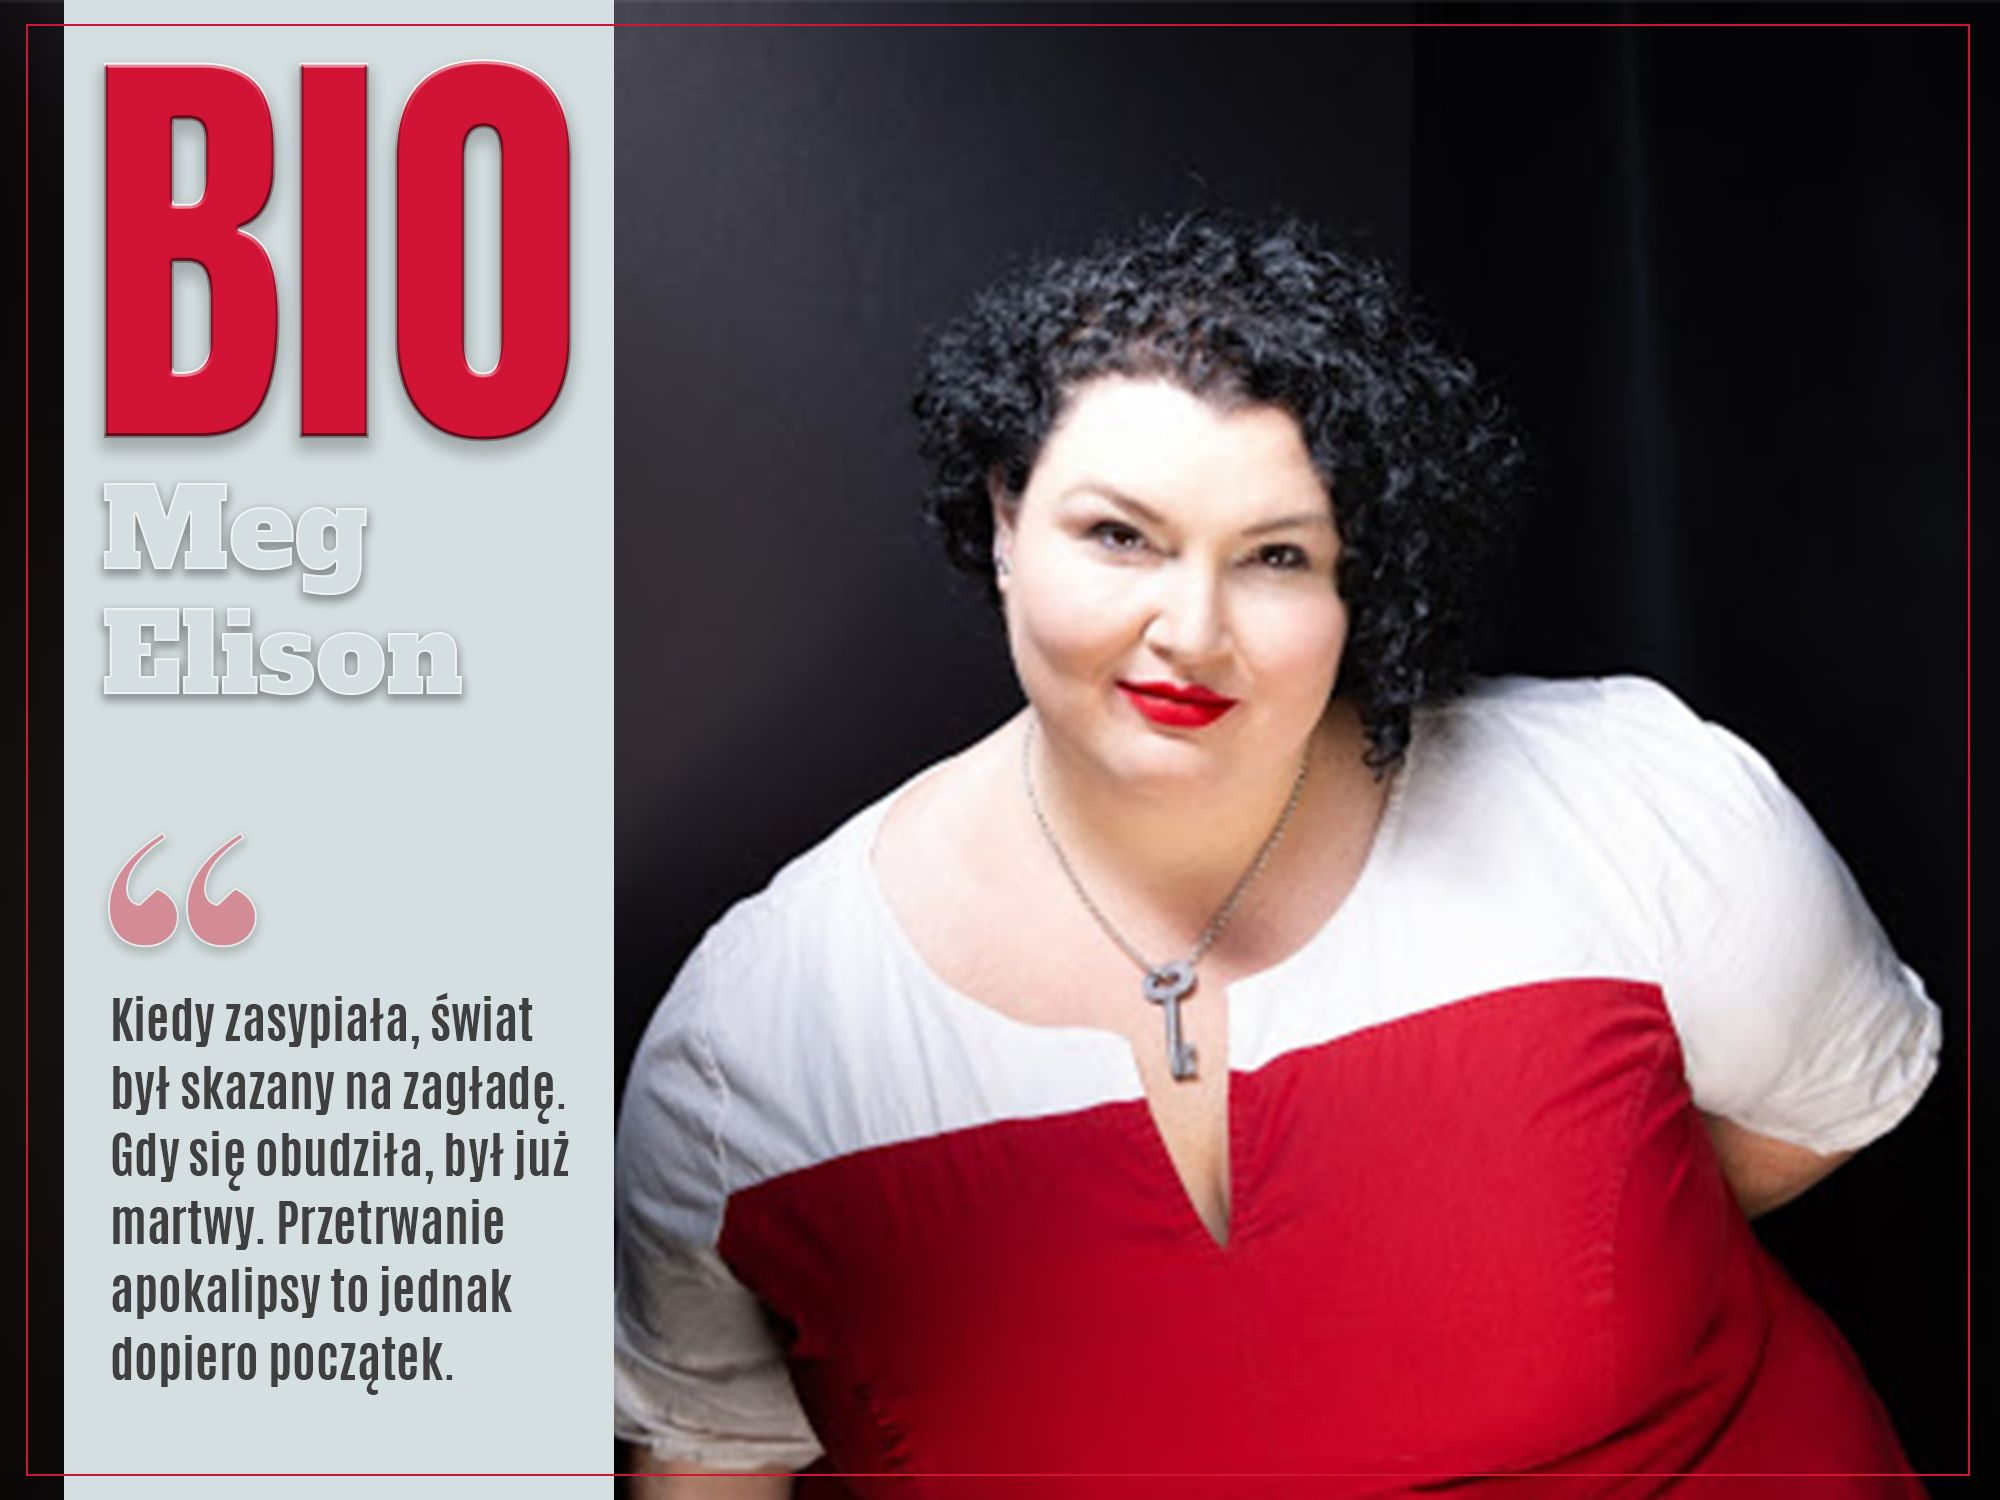 Meg Elison, BIO, zaczytanyksiazkhoolik.pl